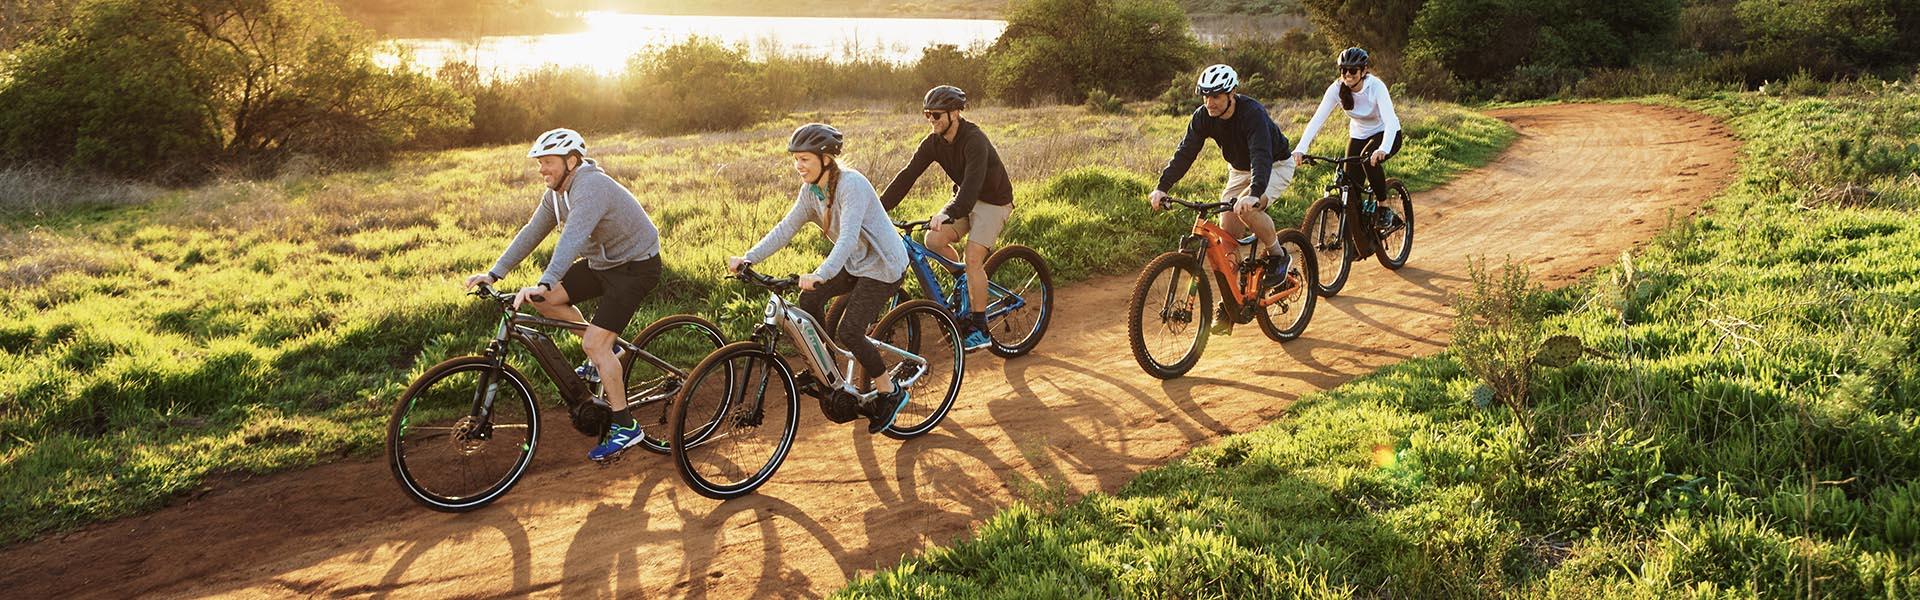 E-bikes For Everyone, Part 1